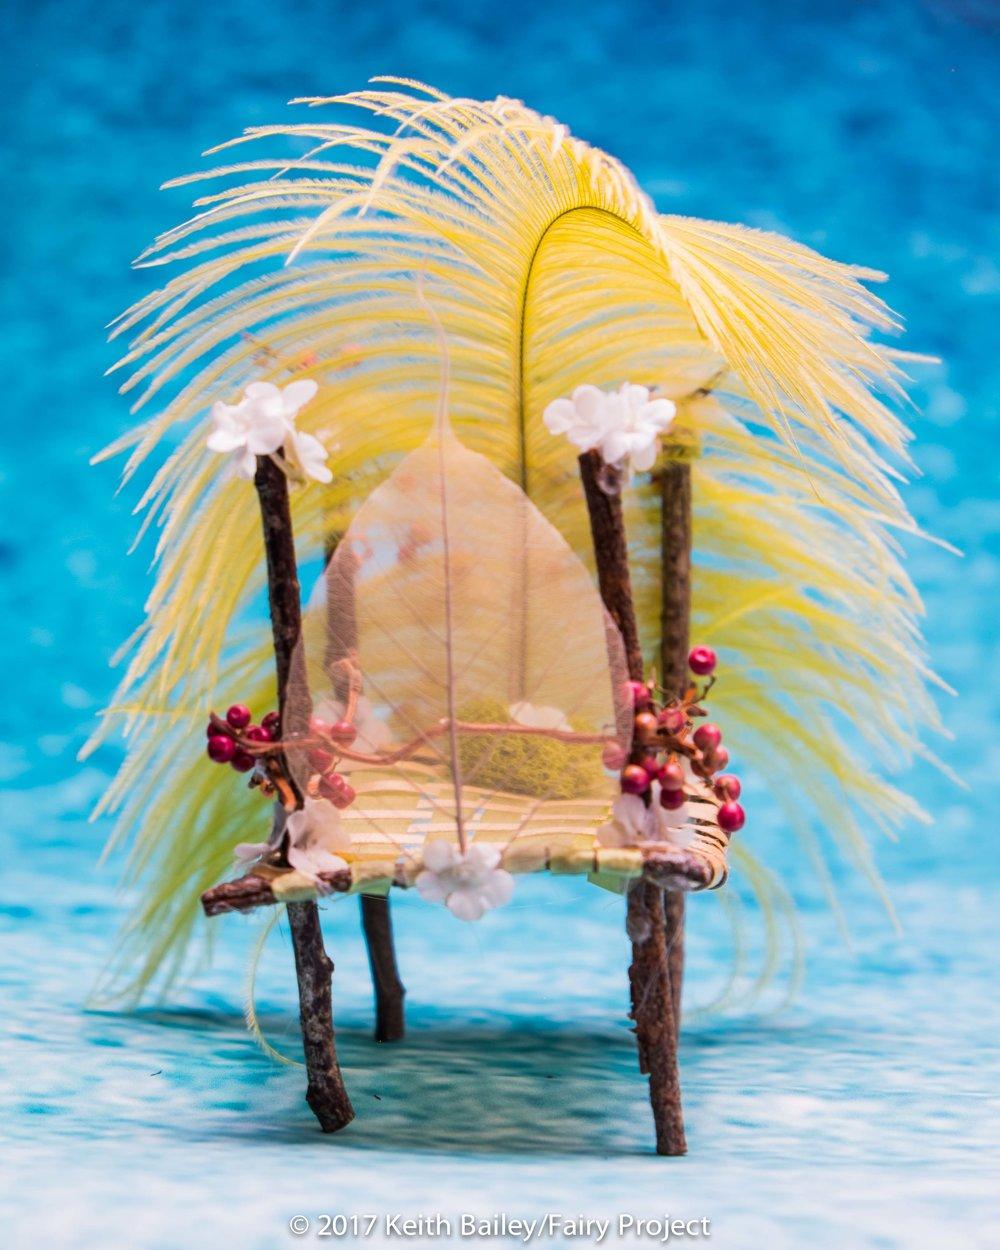 The Fairy Project - Caribbean